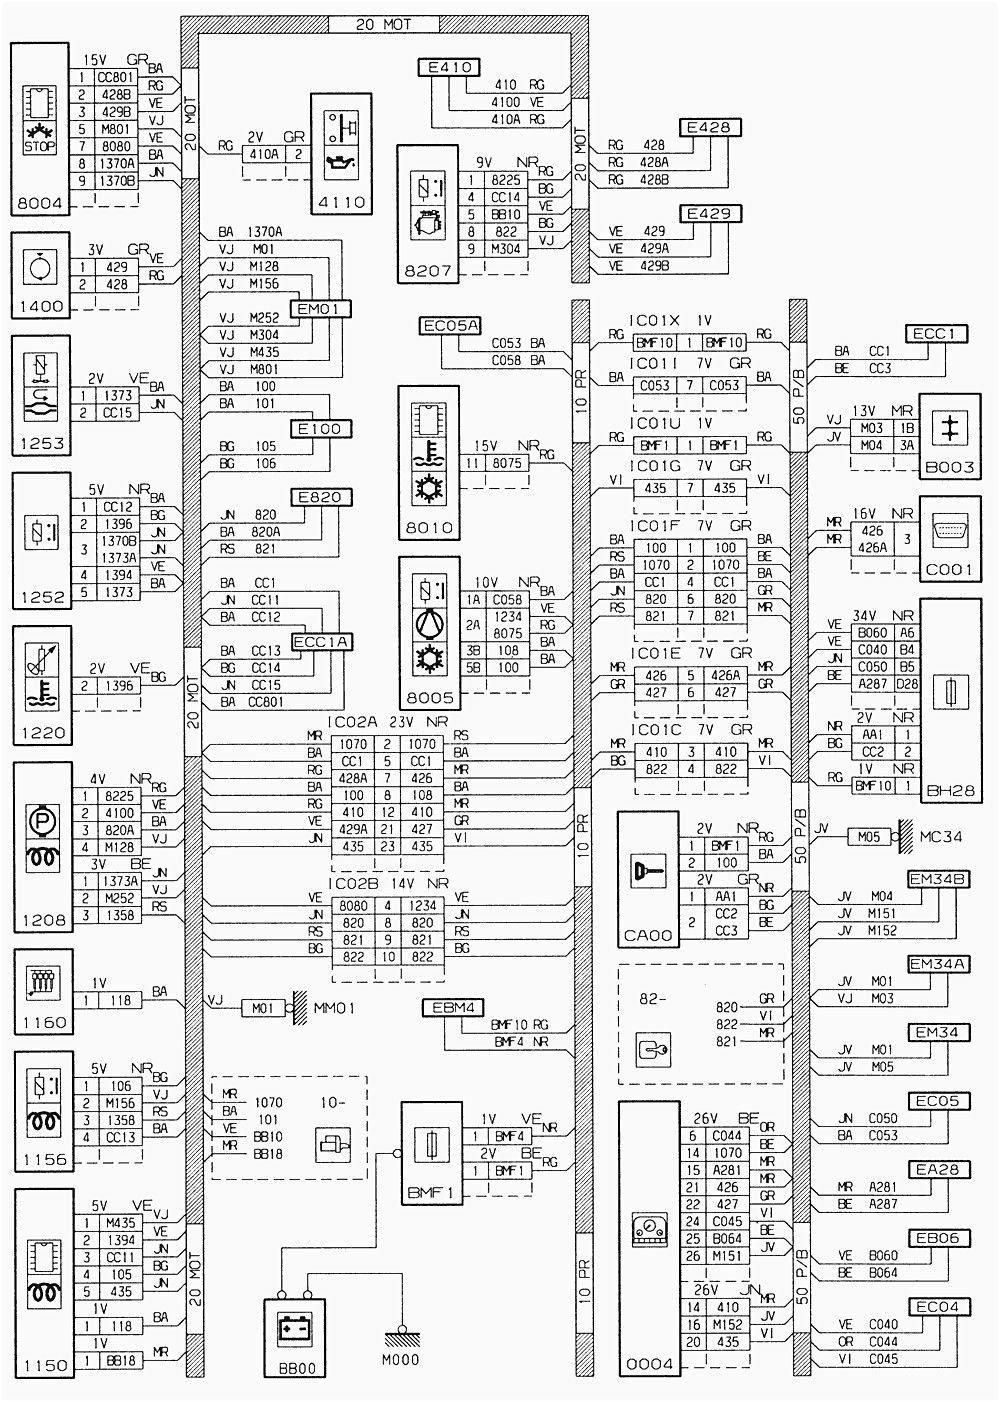 Miraculous Peugeot Wiring Diagrams 206 Basic Electronics Wiring Diagram Wiring Cloud Ittabpendurdonanfuldomelitekicepsianuembamohammedshrineorg